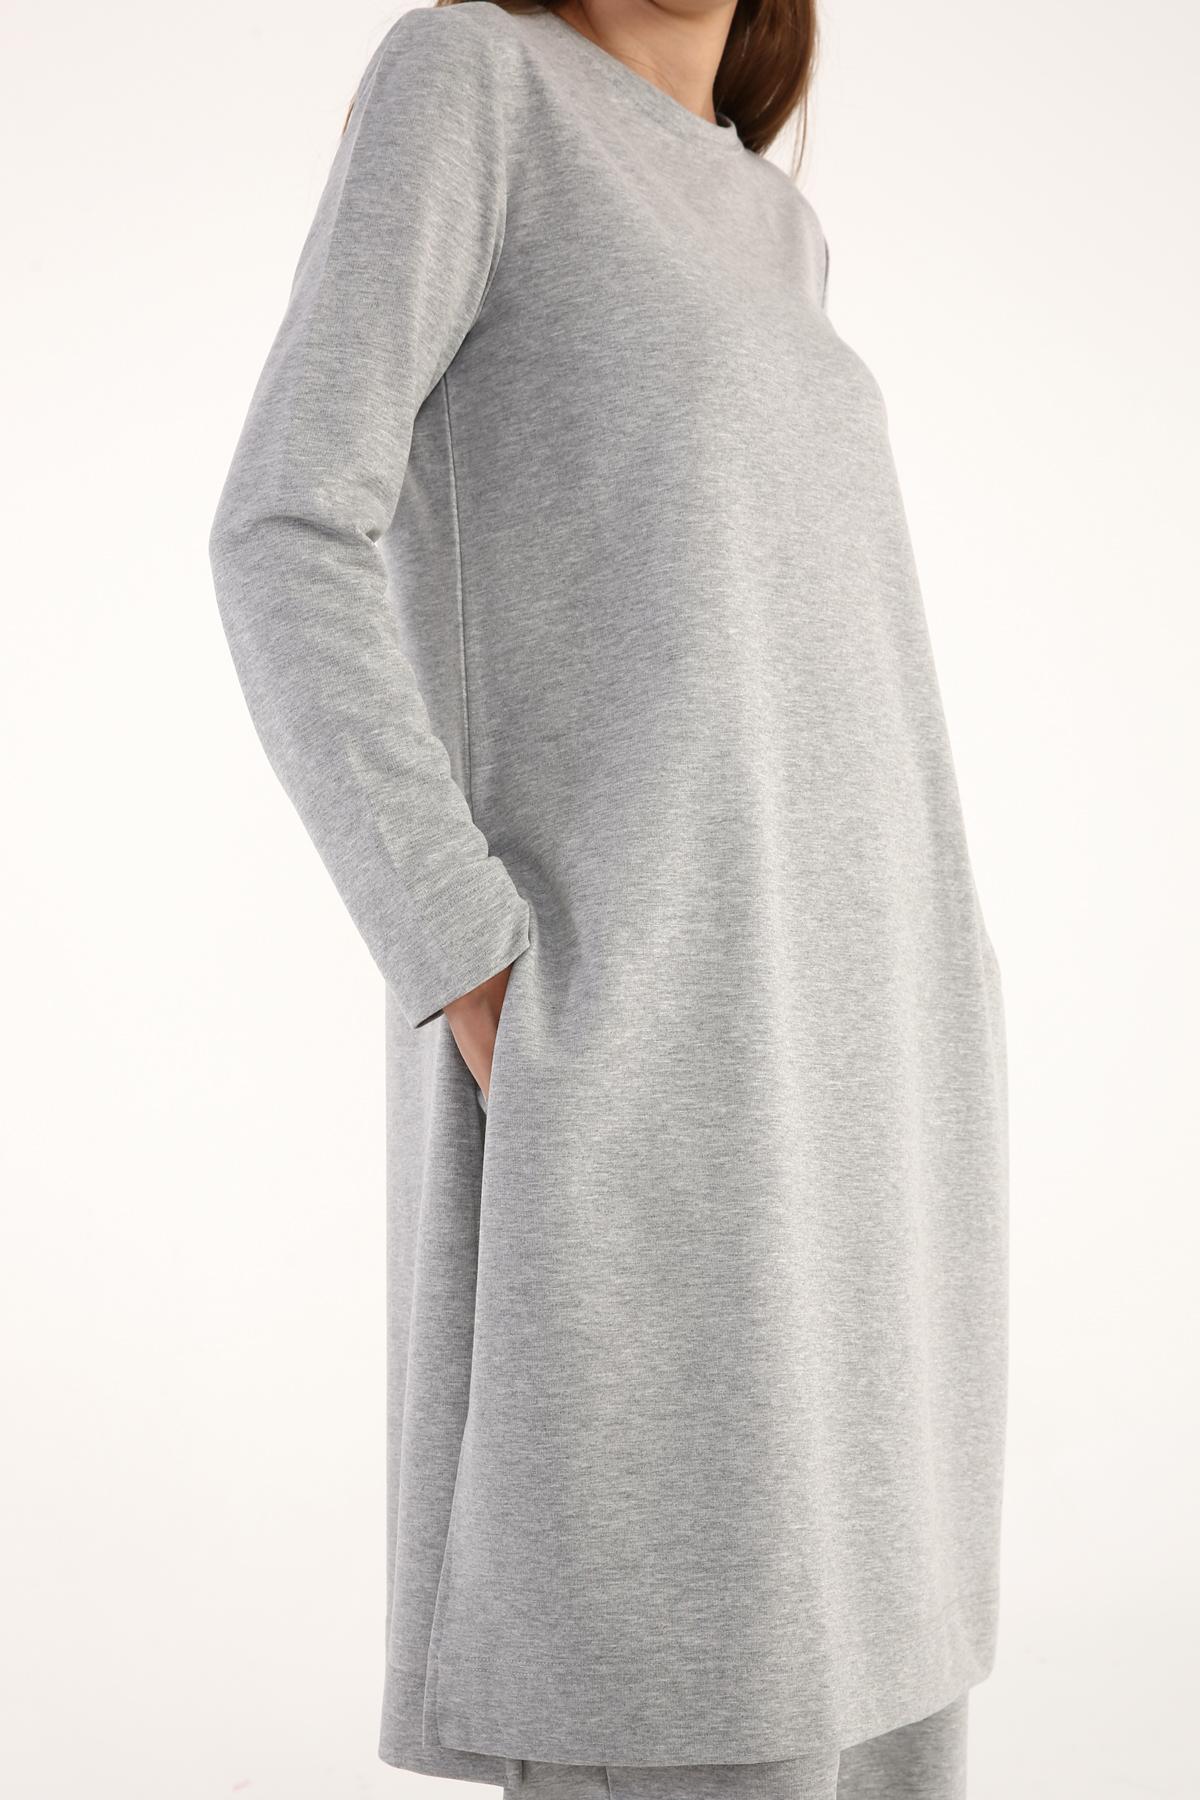 Cotton Basic Pants and Slit Detailed Blouse Set